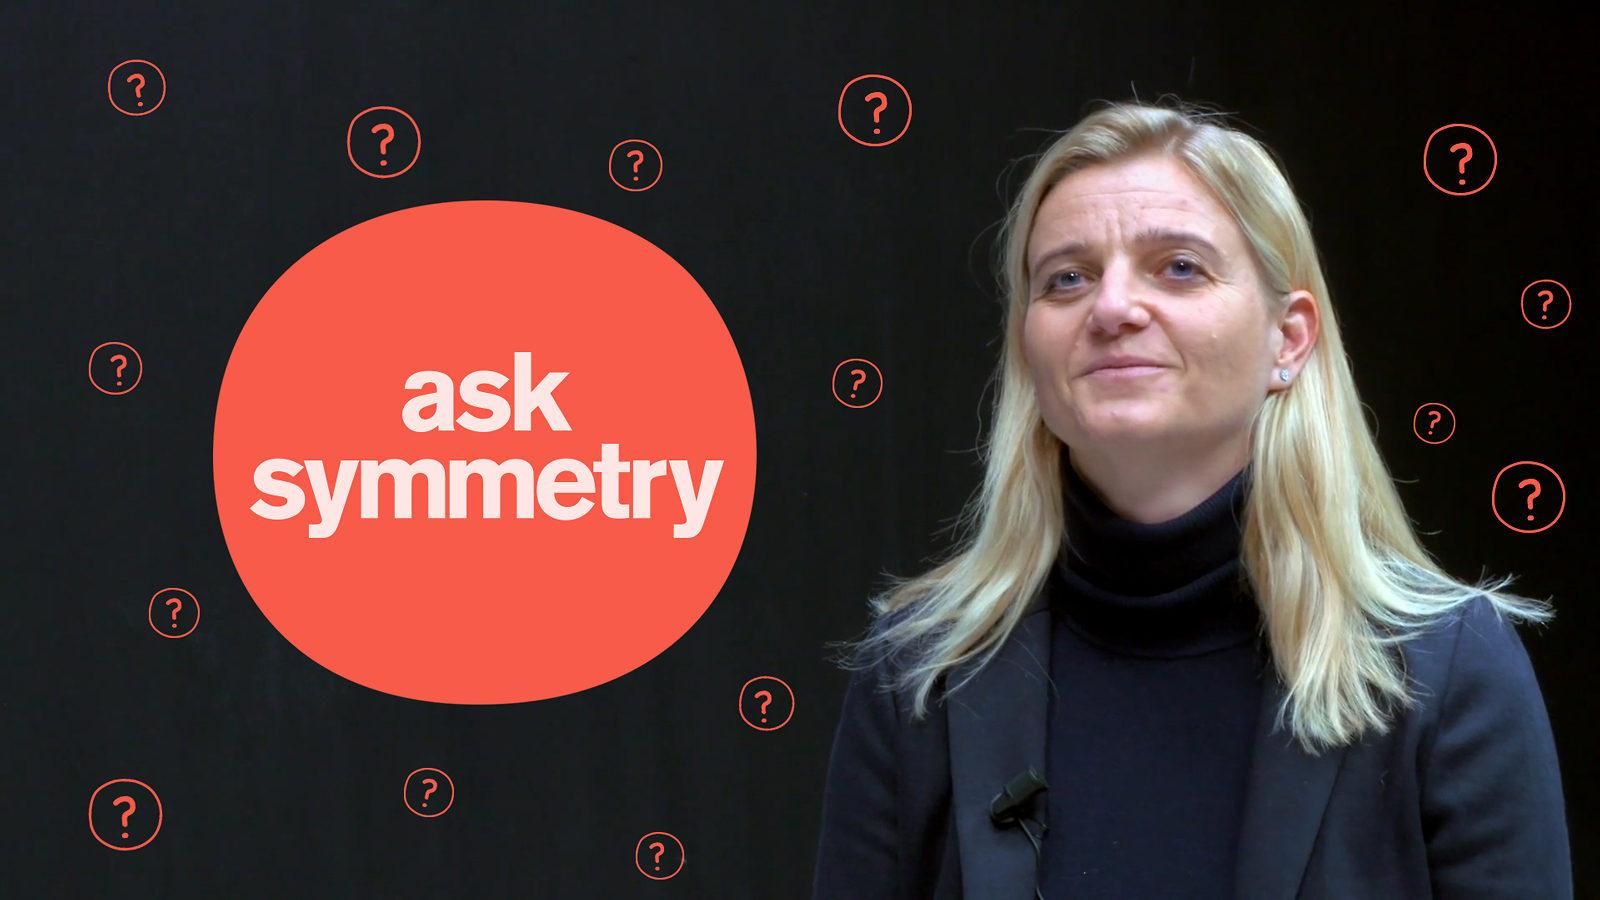 Ask Symmetry: EddaGschwendtner